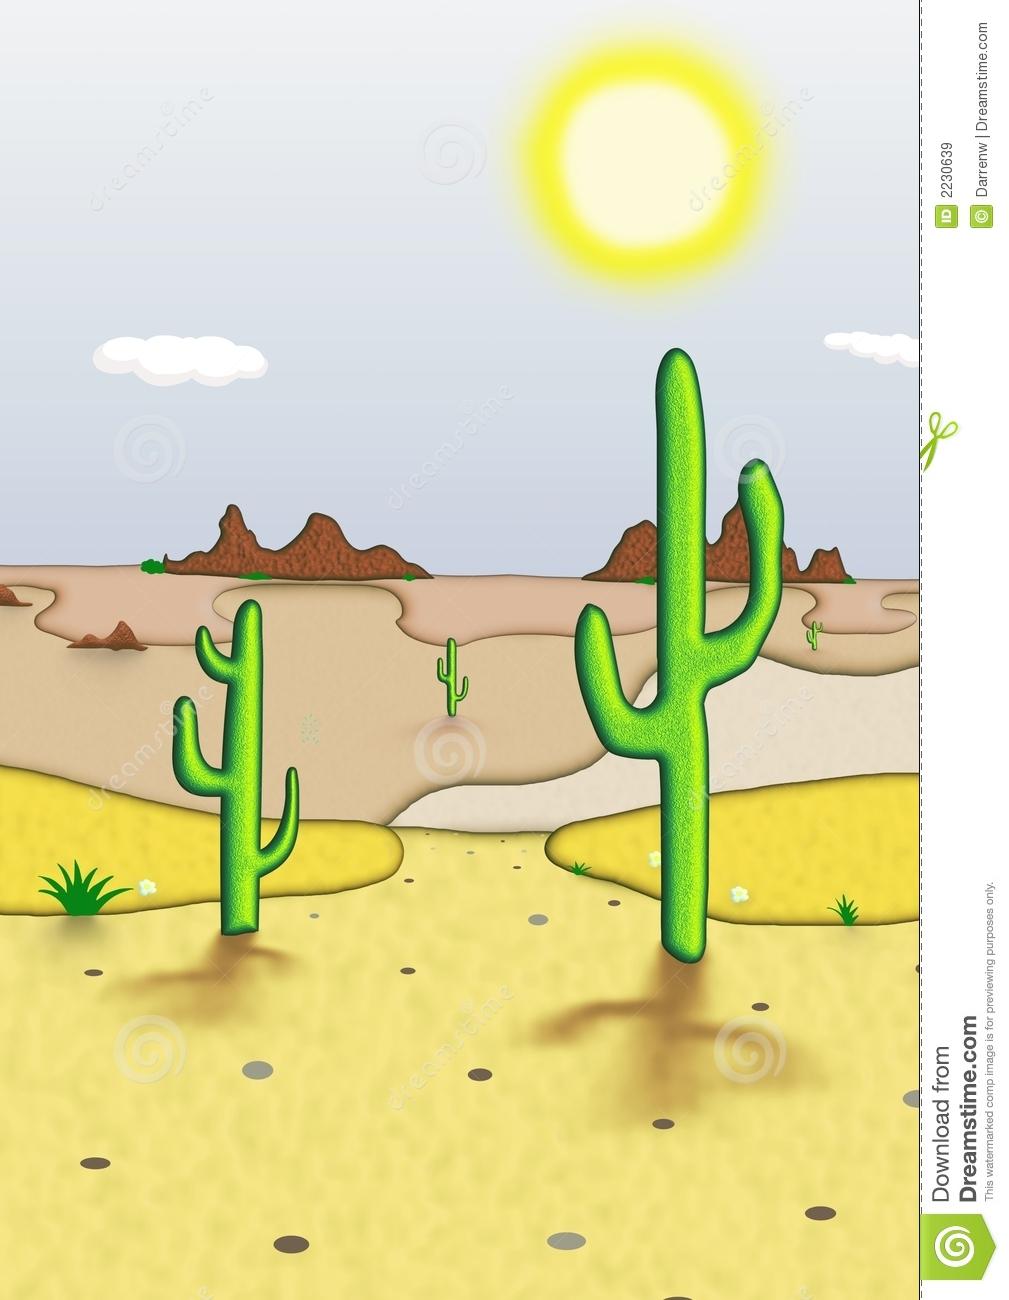 Desert Scenes Clipart.